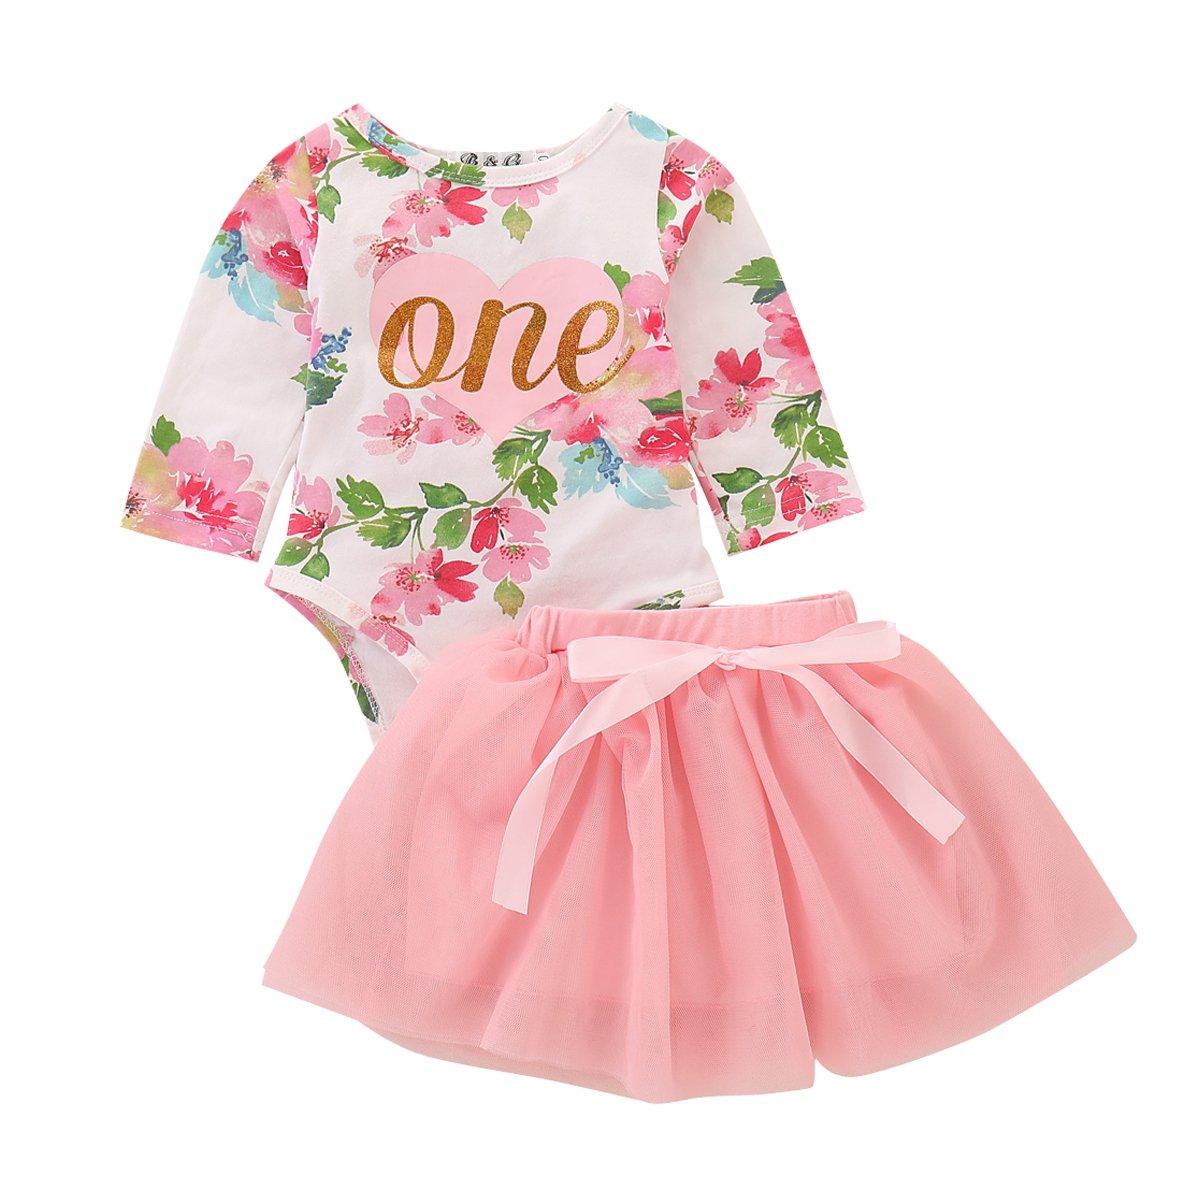 Newborn Baby Girls Clothes Floral Romper Top + Tutu Skirt Dresses 2Pcs Outfit Set (Long Sleeve, 90/12-18M)